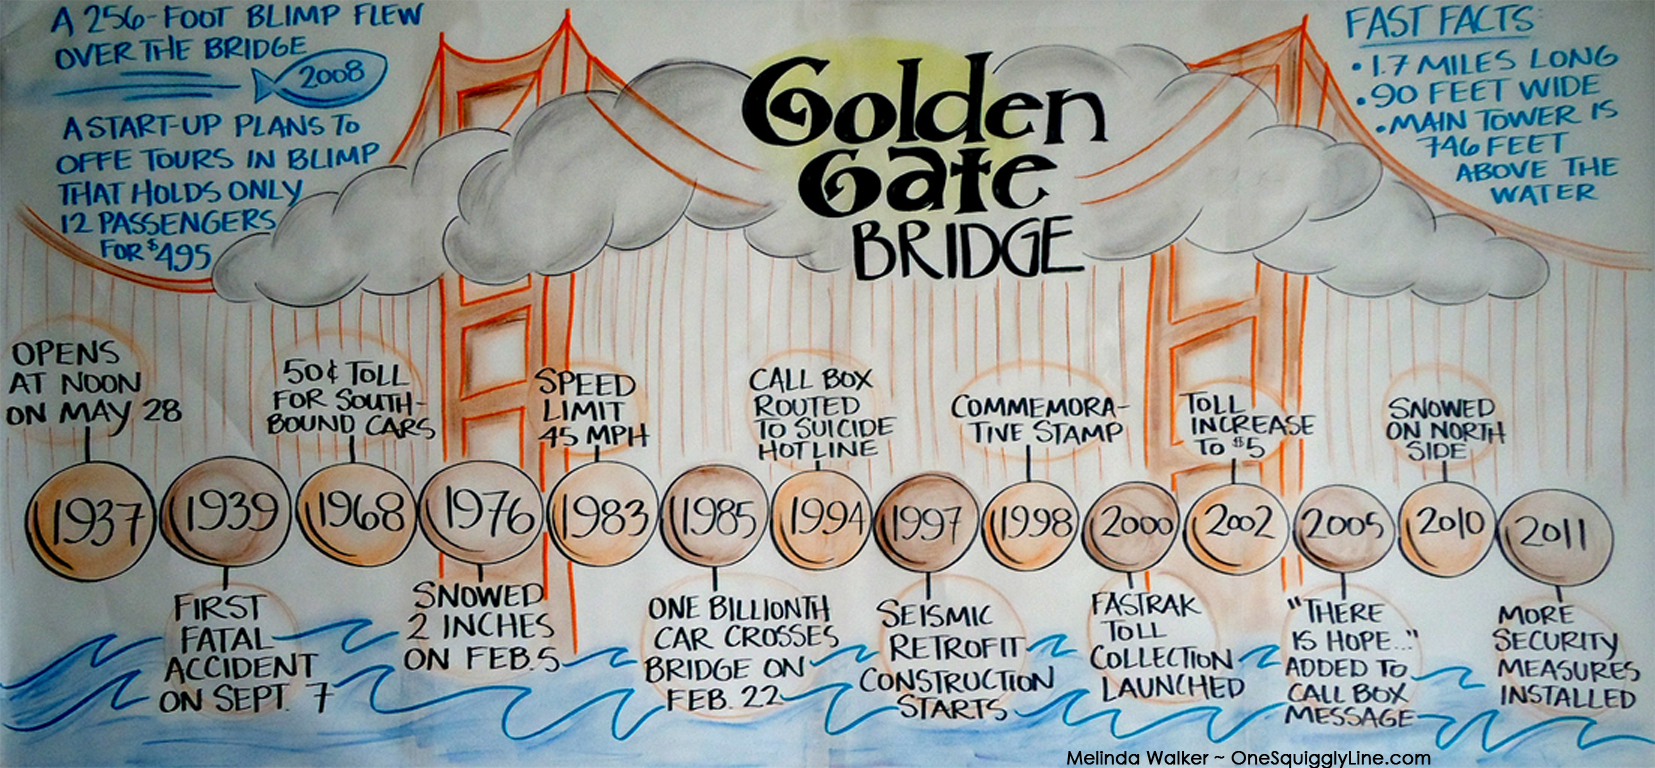 Timeline_GoldenGateBridge_MelindaWalker_OneSquigglyLine